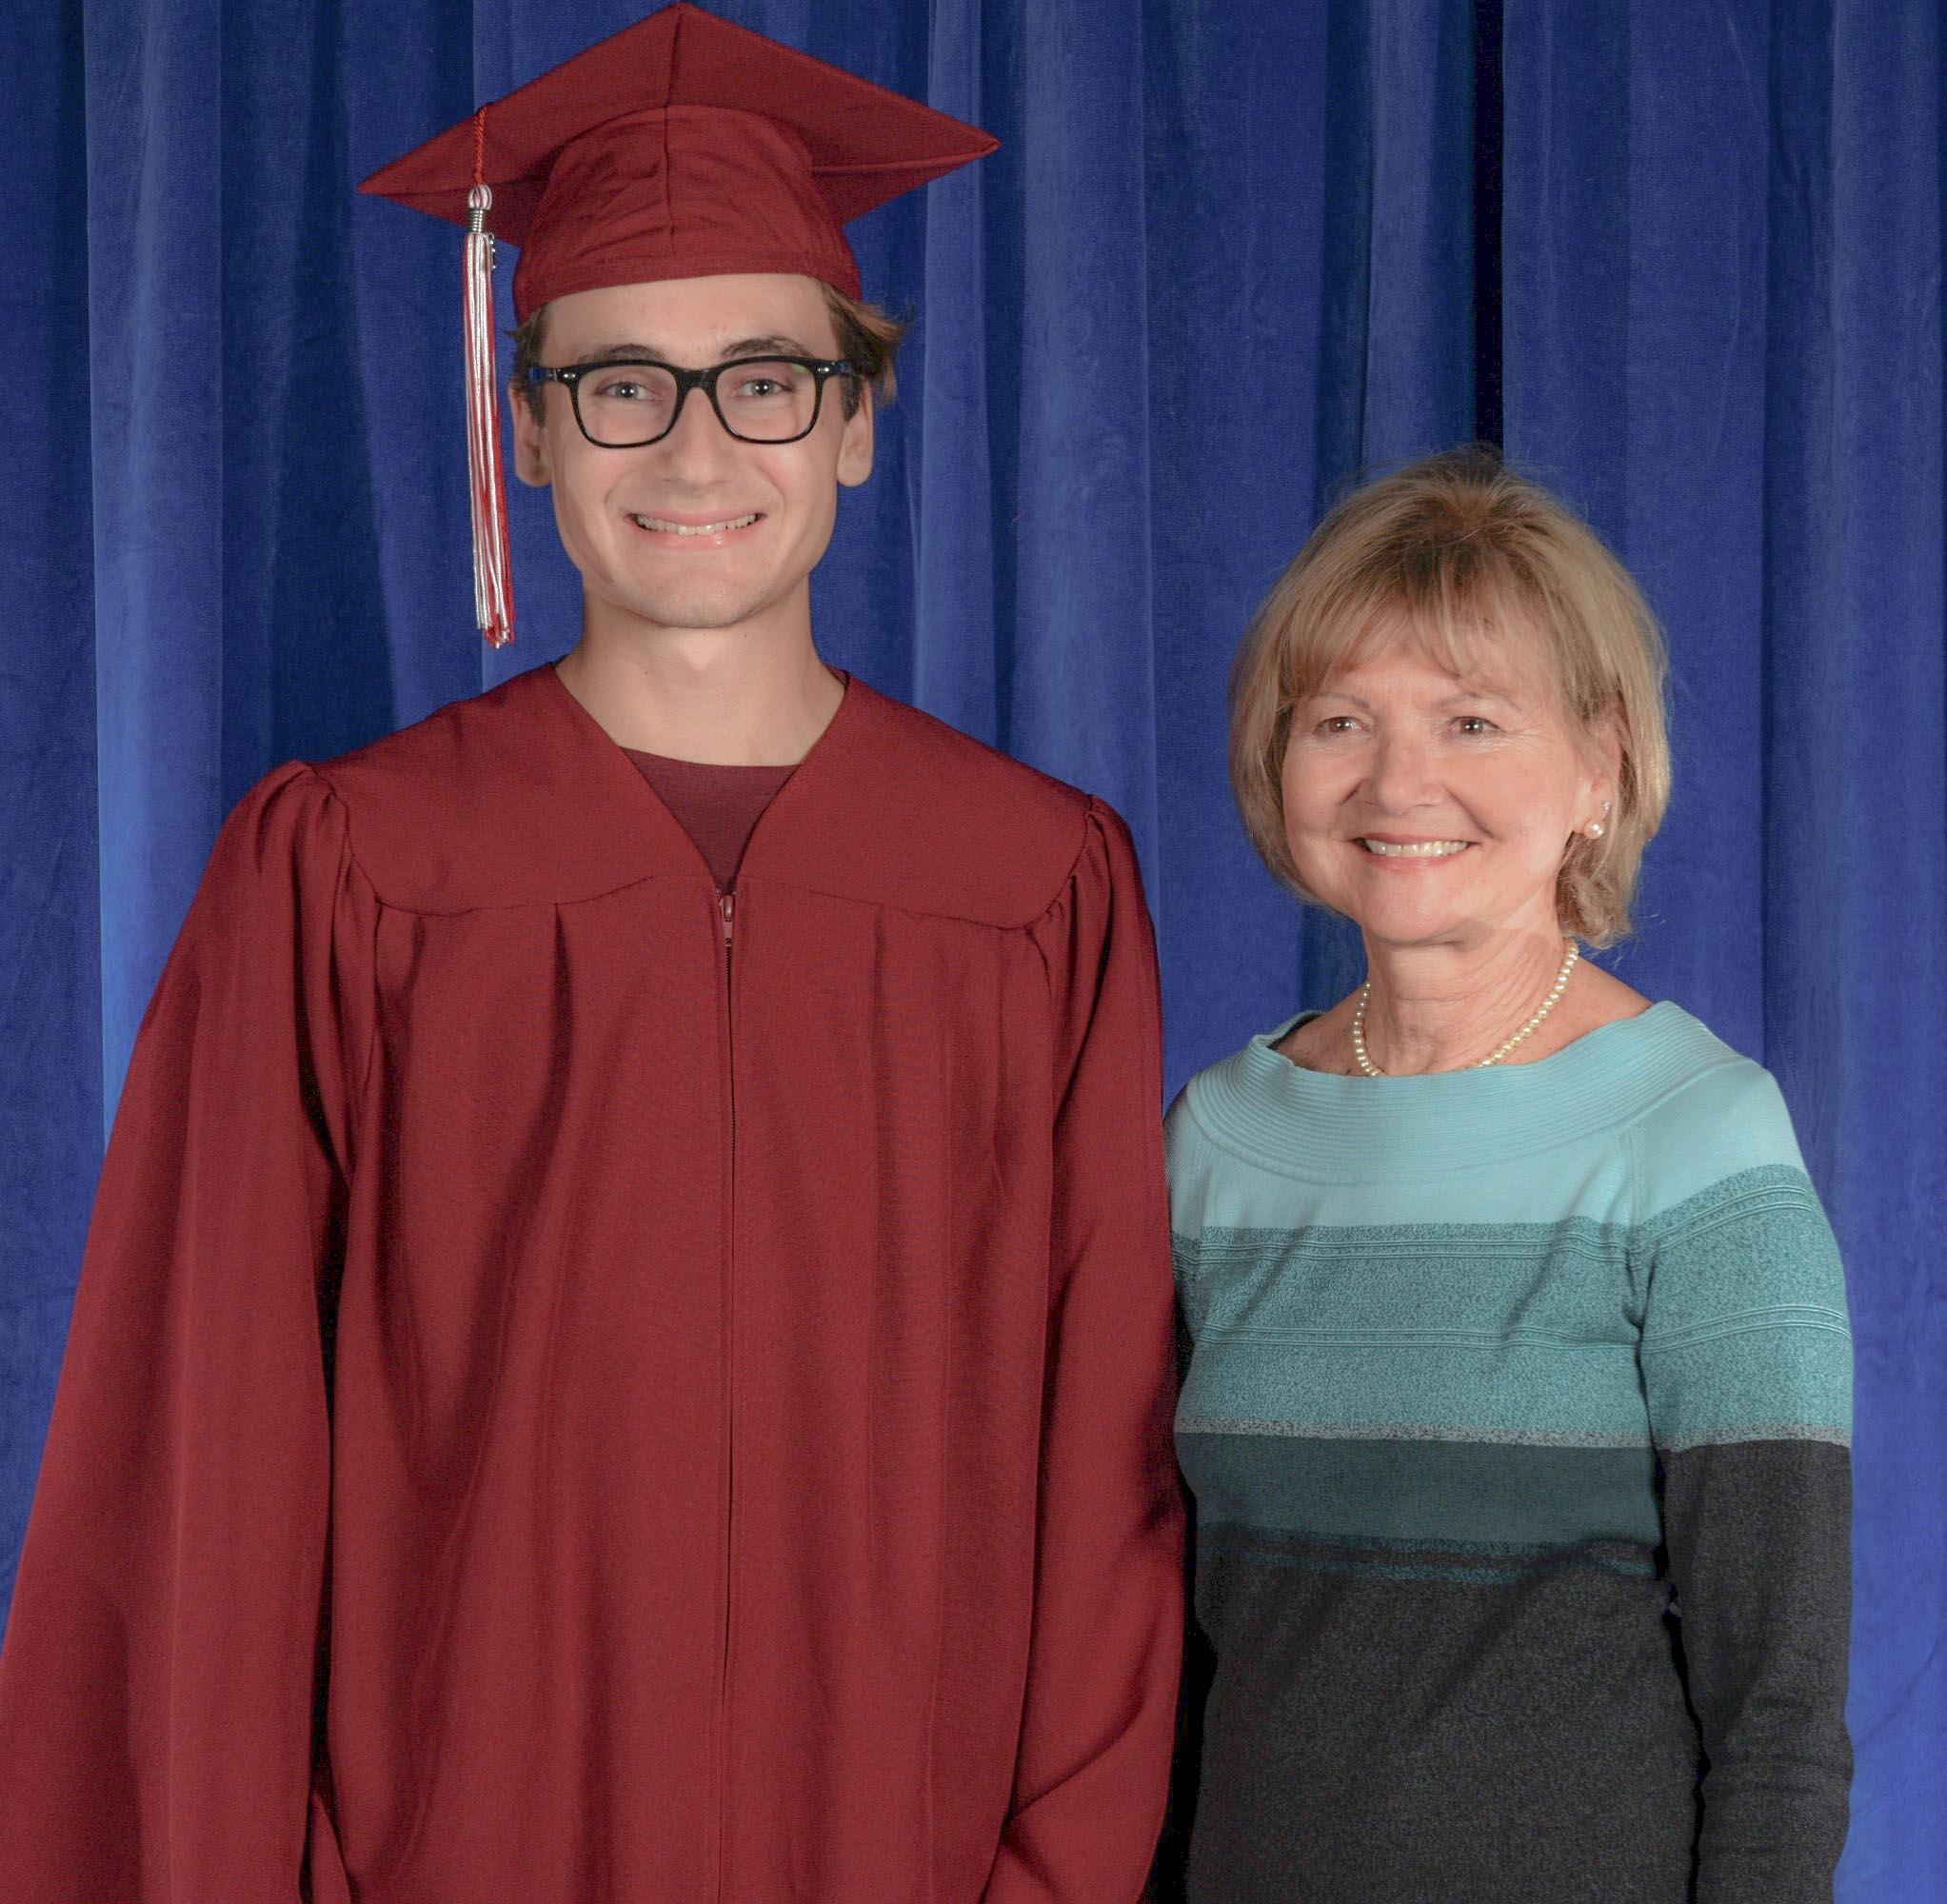 Village Laguna Judy Teverbaugh and 2019 Scholarship winner Charles Dickerson